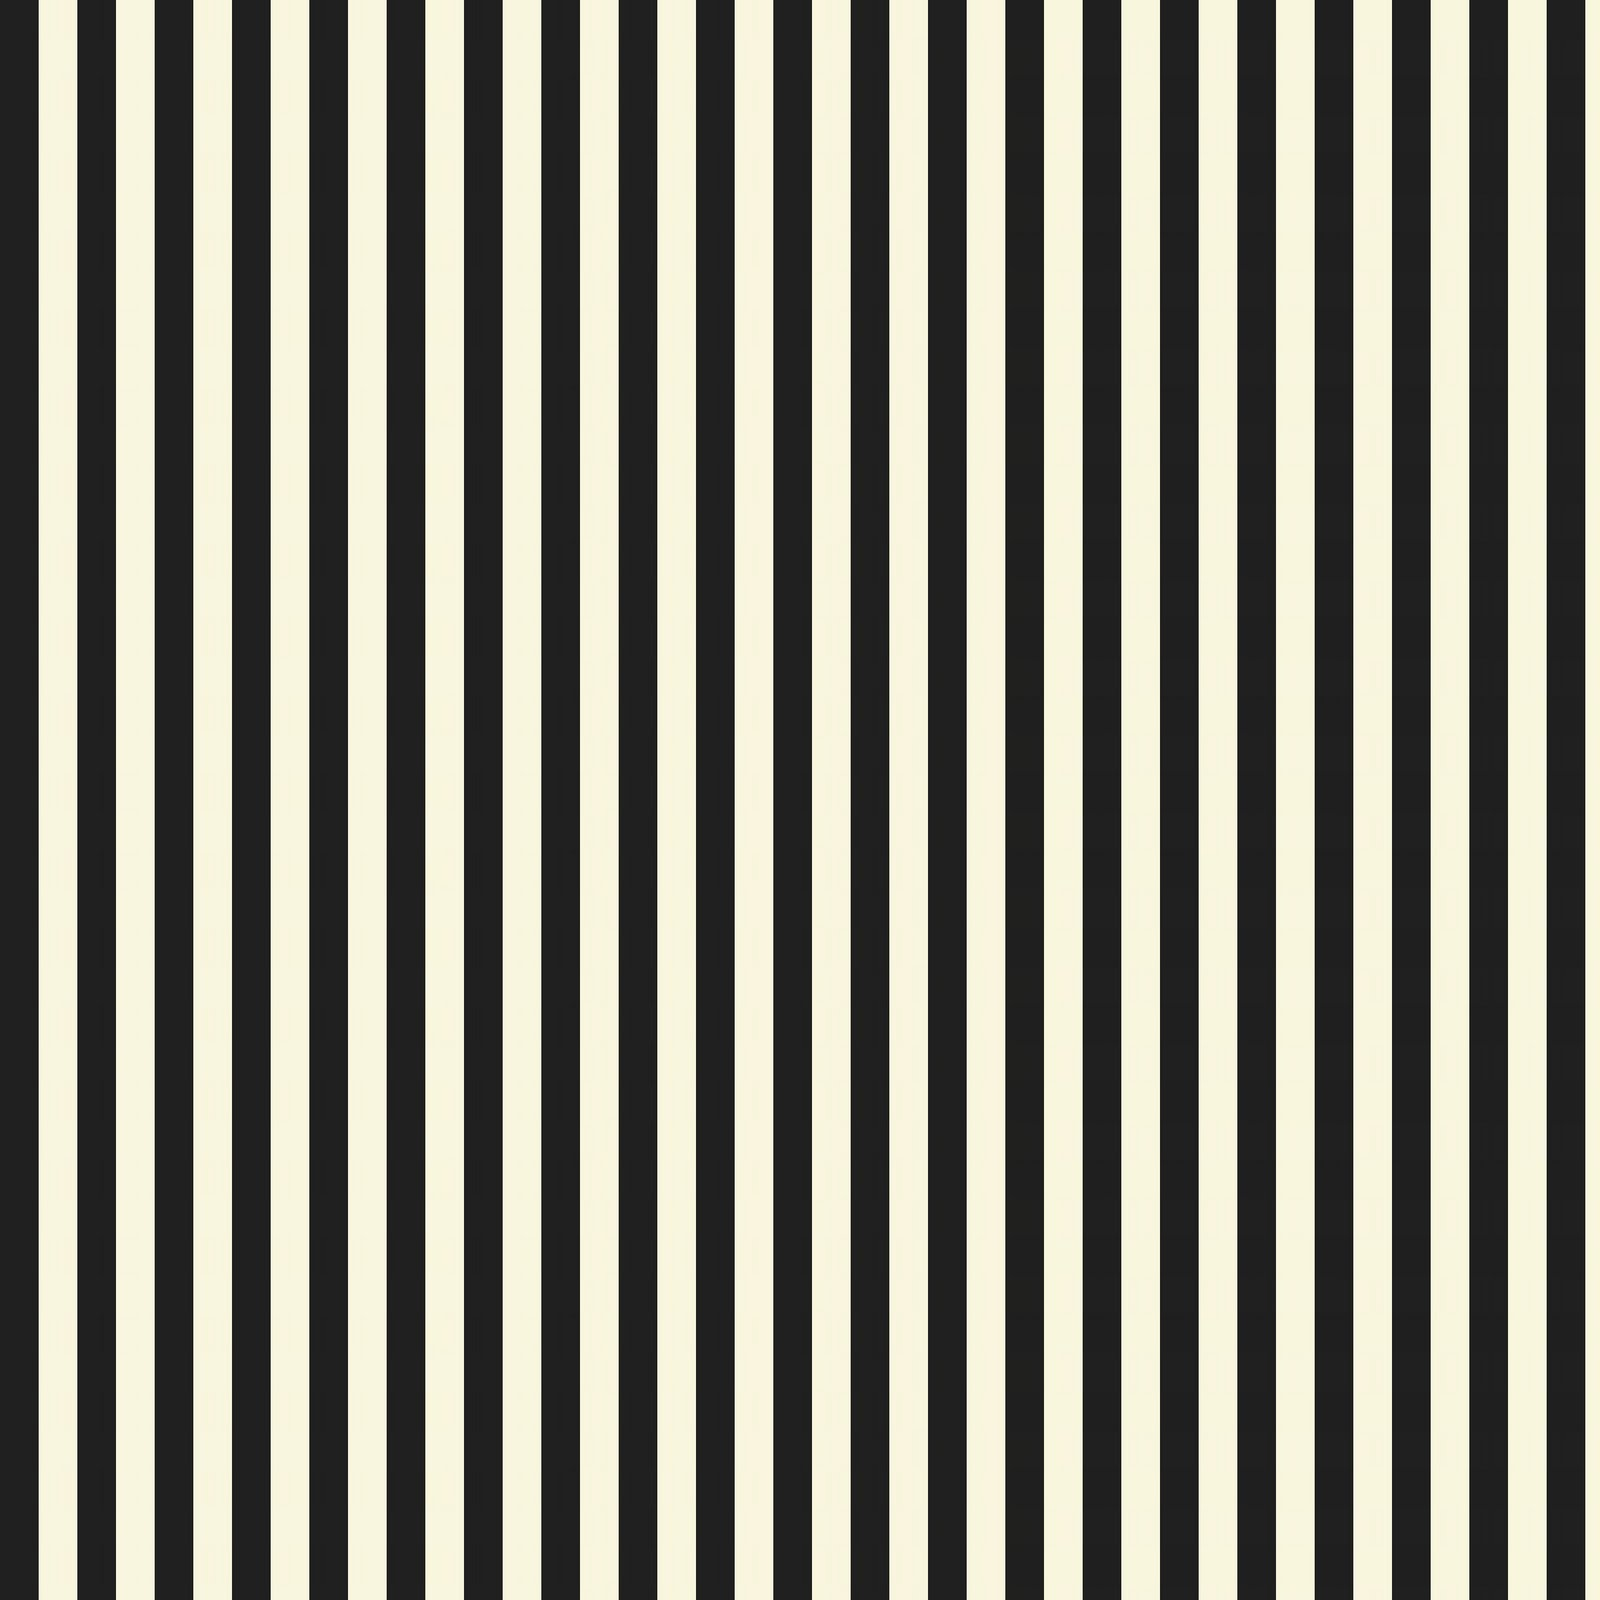 [48+] Black and White Stripes Wallpaper on WallpaperSafari